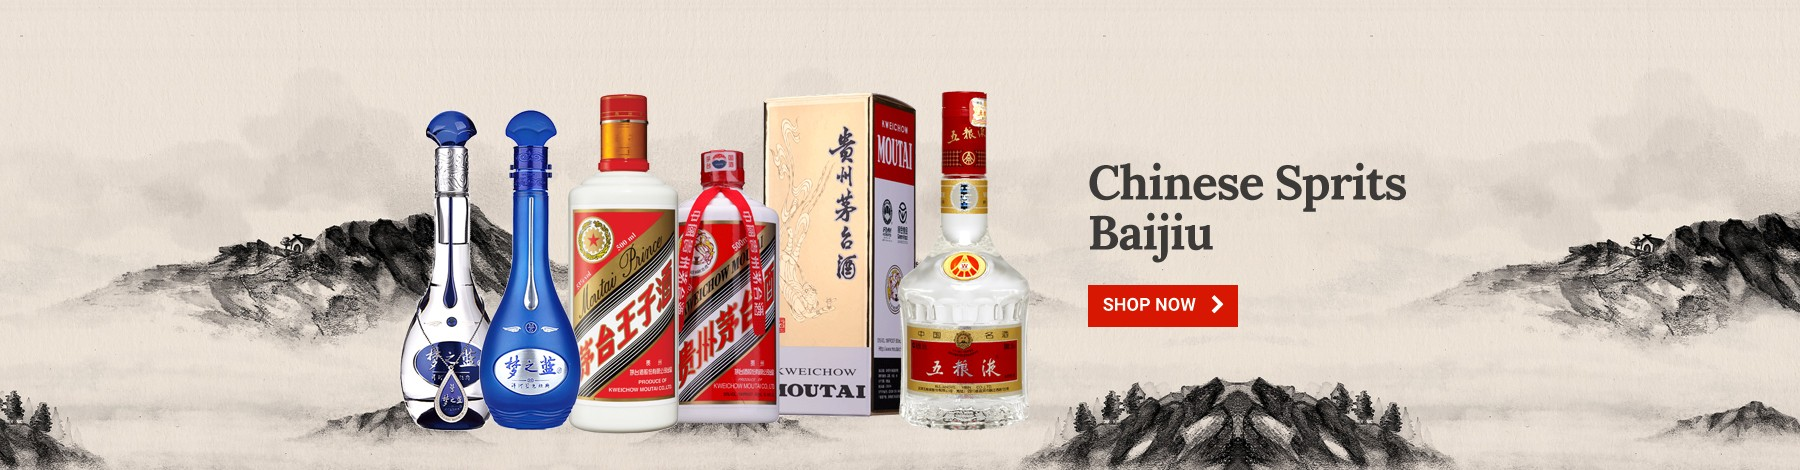 Chinese Sprits/Baijiu